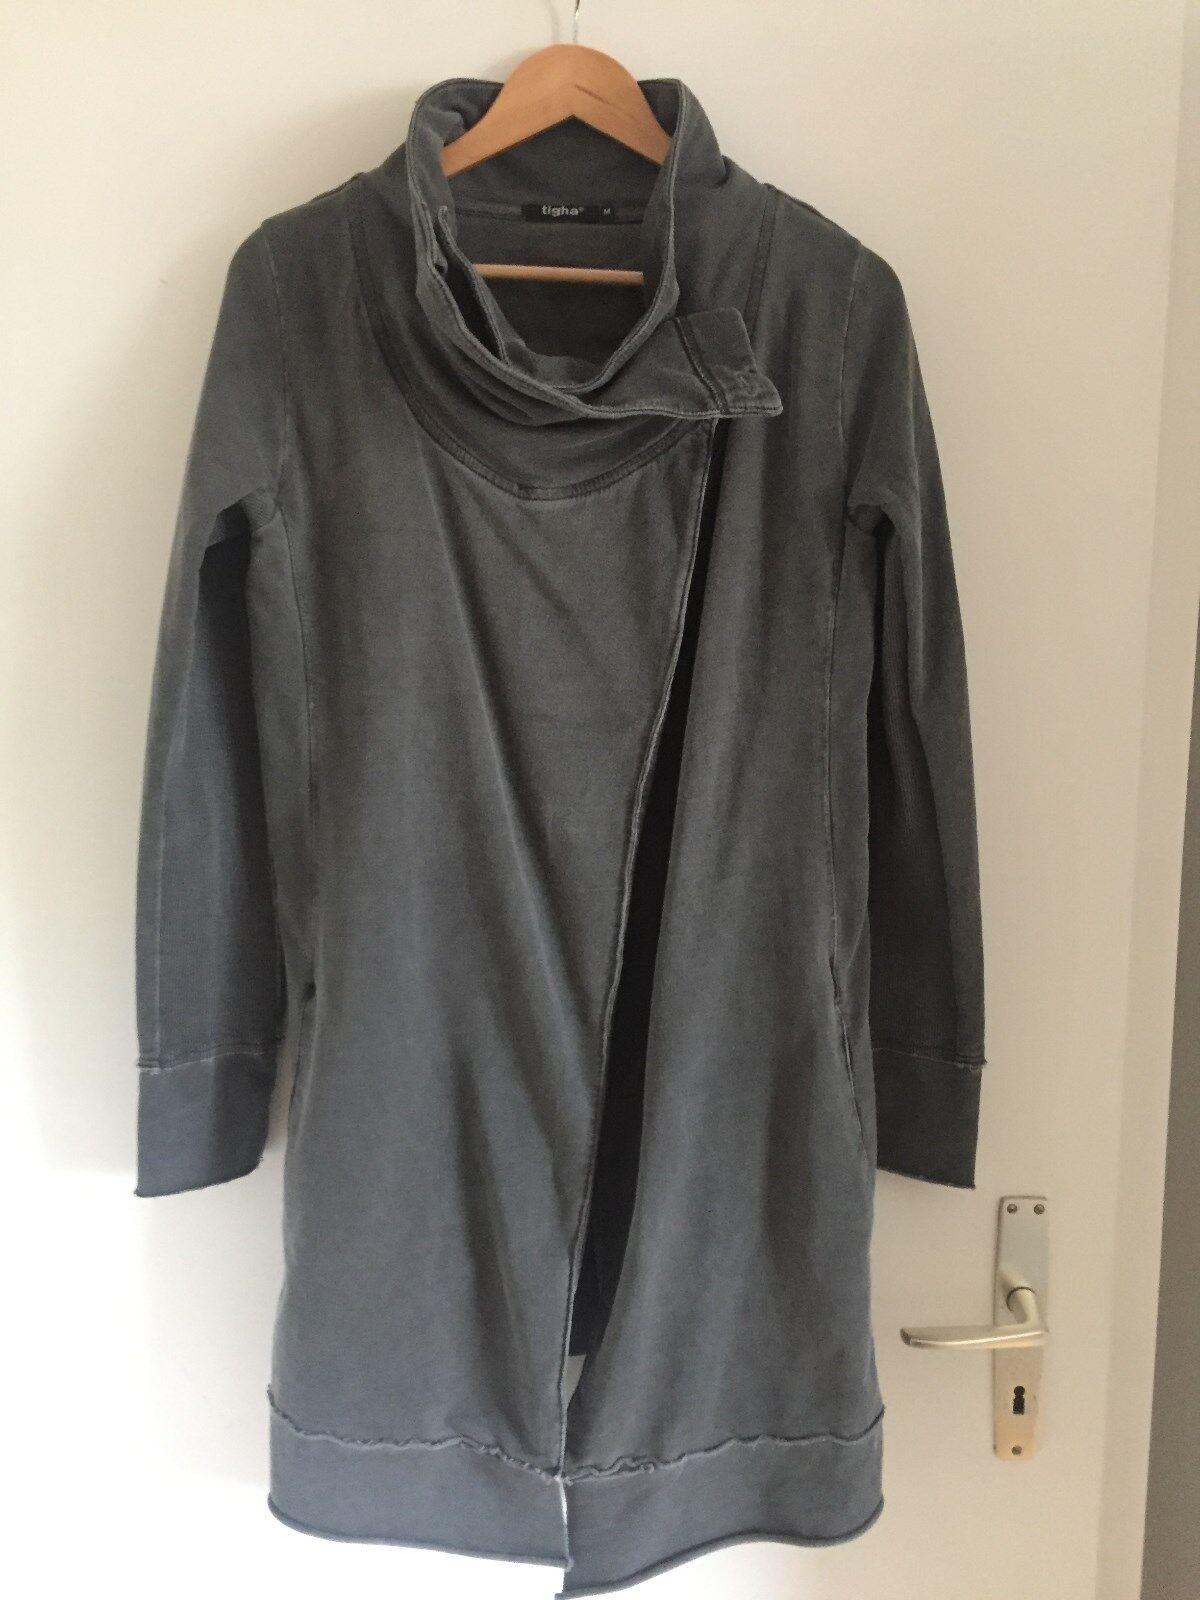 TIGHA obercoole Jacke schweißjacke mit Wasserfallkragen dunkelgrau Gr. M 38